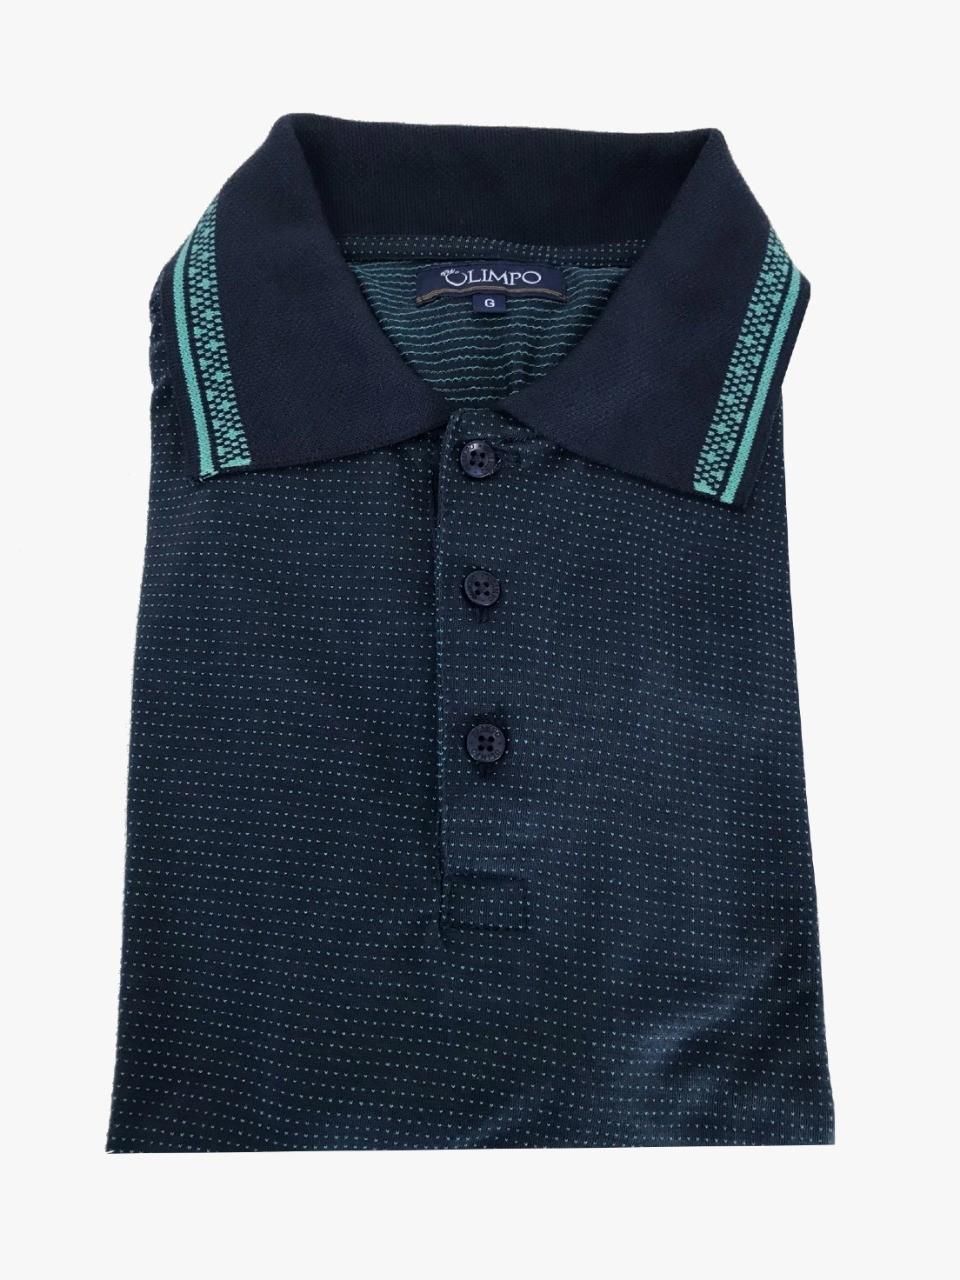 Camisa Gola Polo Olimpo Malha Jacguard Viscose